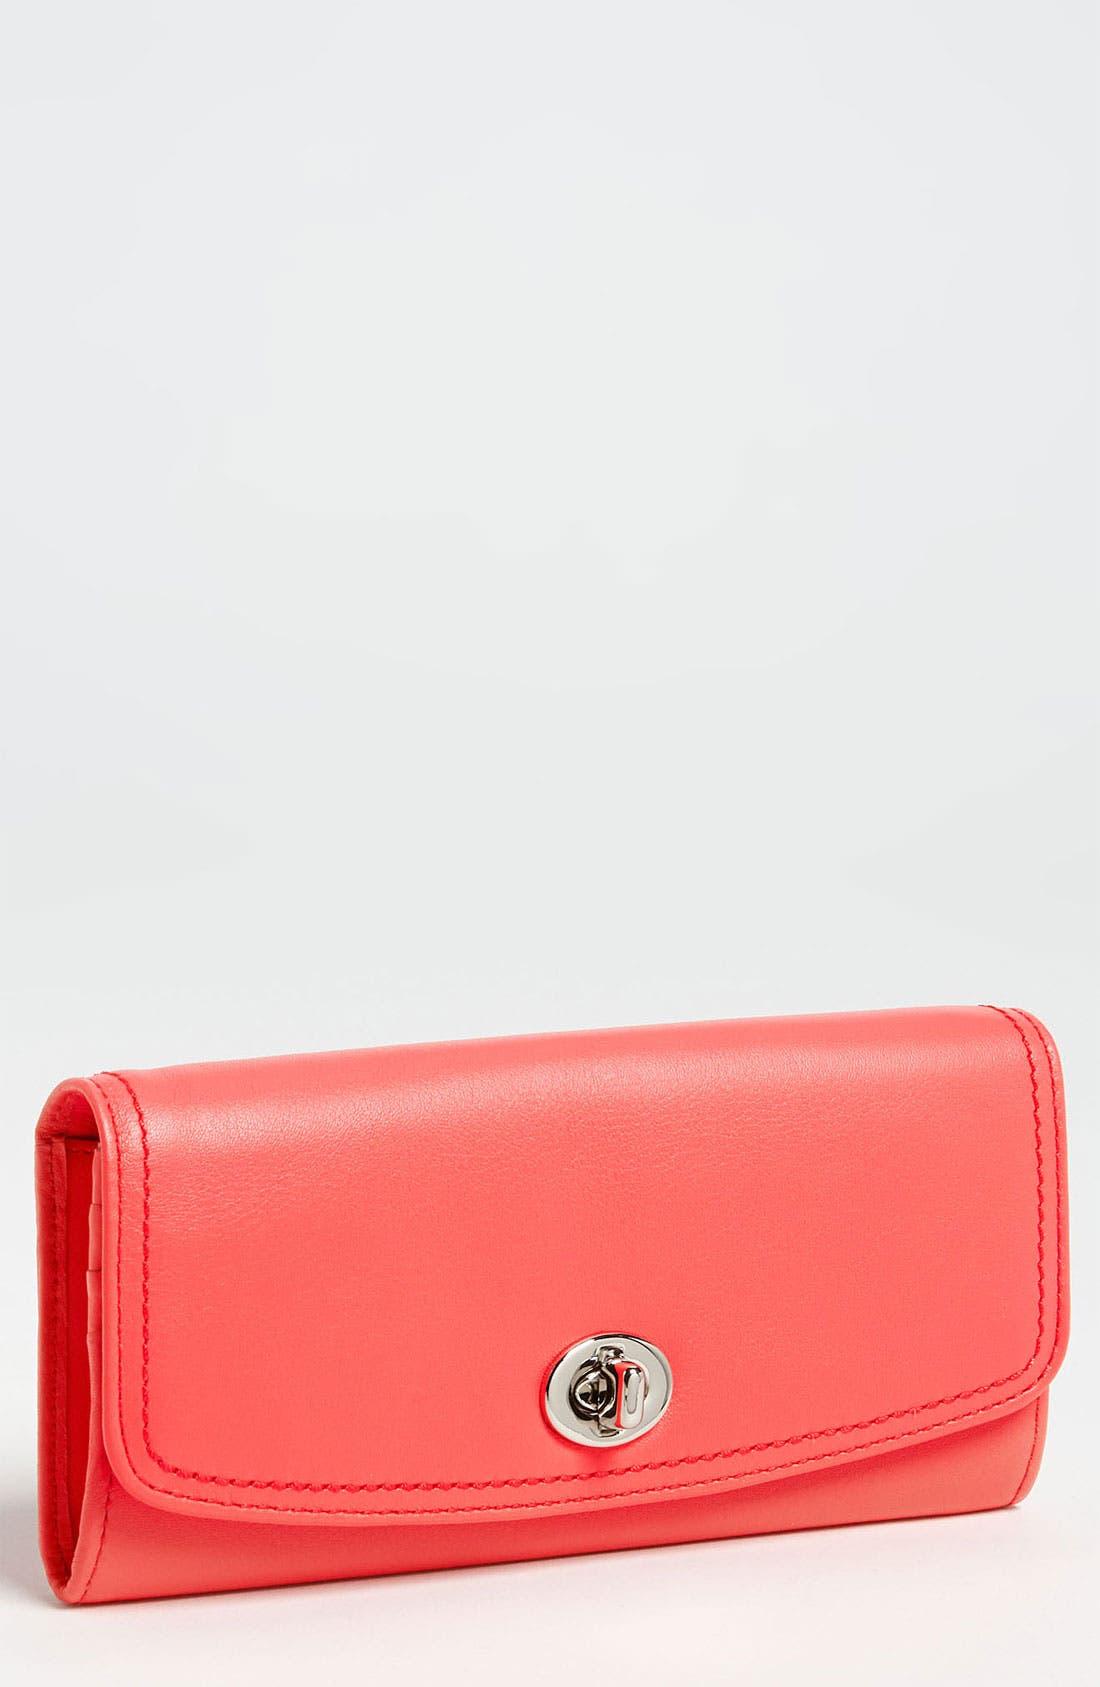 Main Image - COACH 'Legacy - Slim' Leather Envelope Wallet